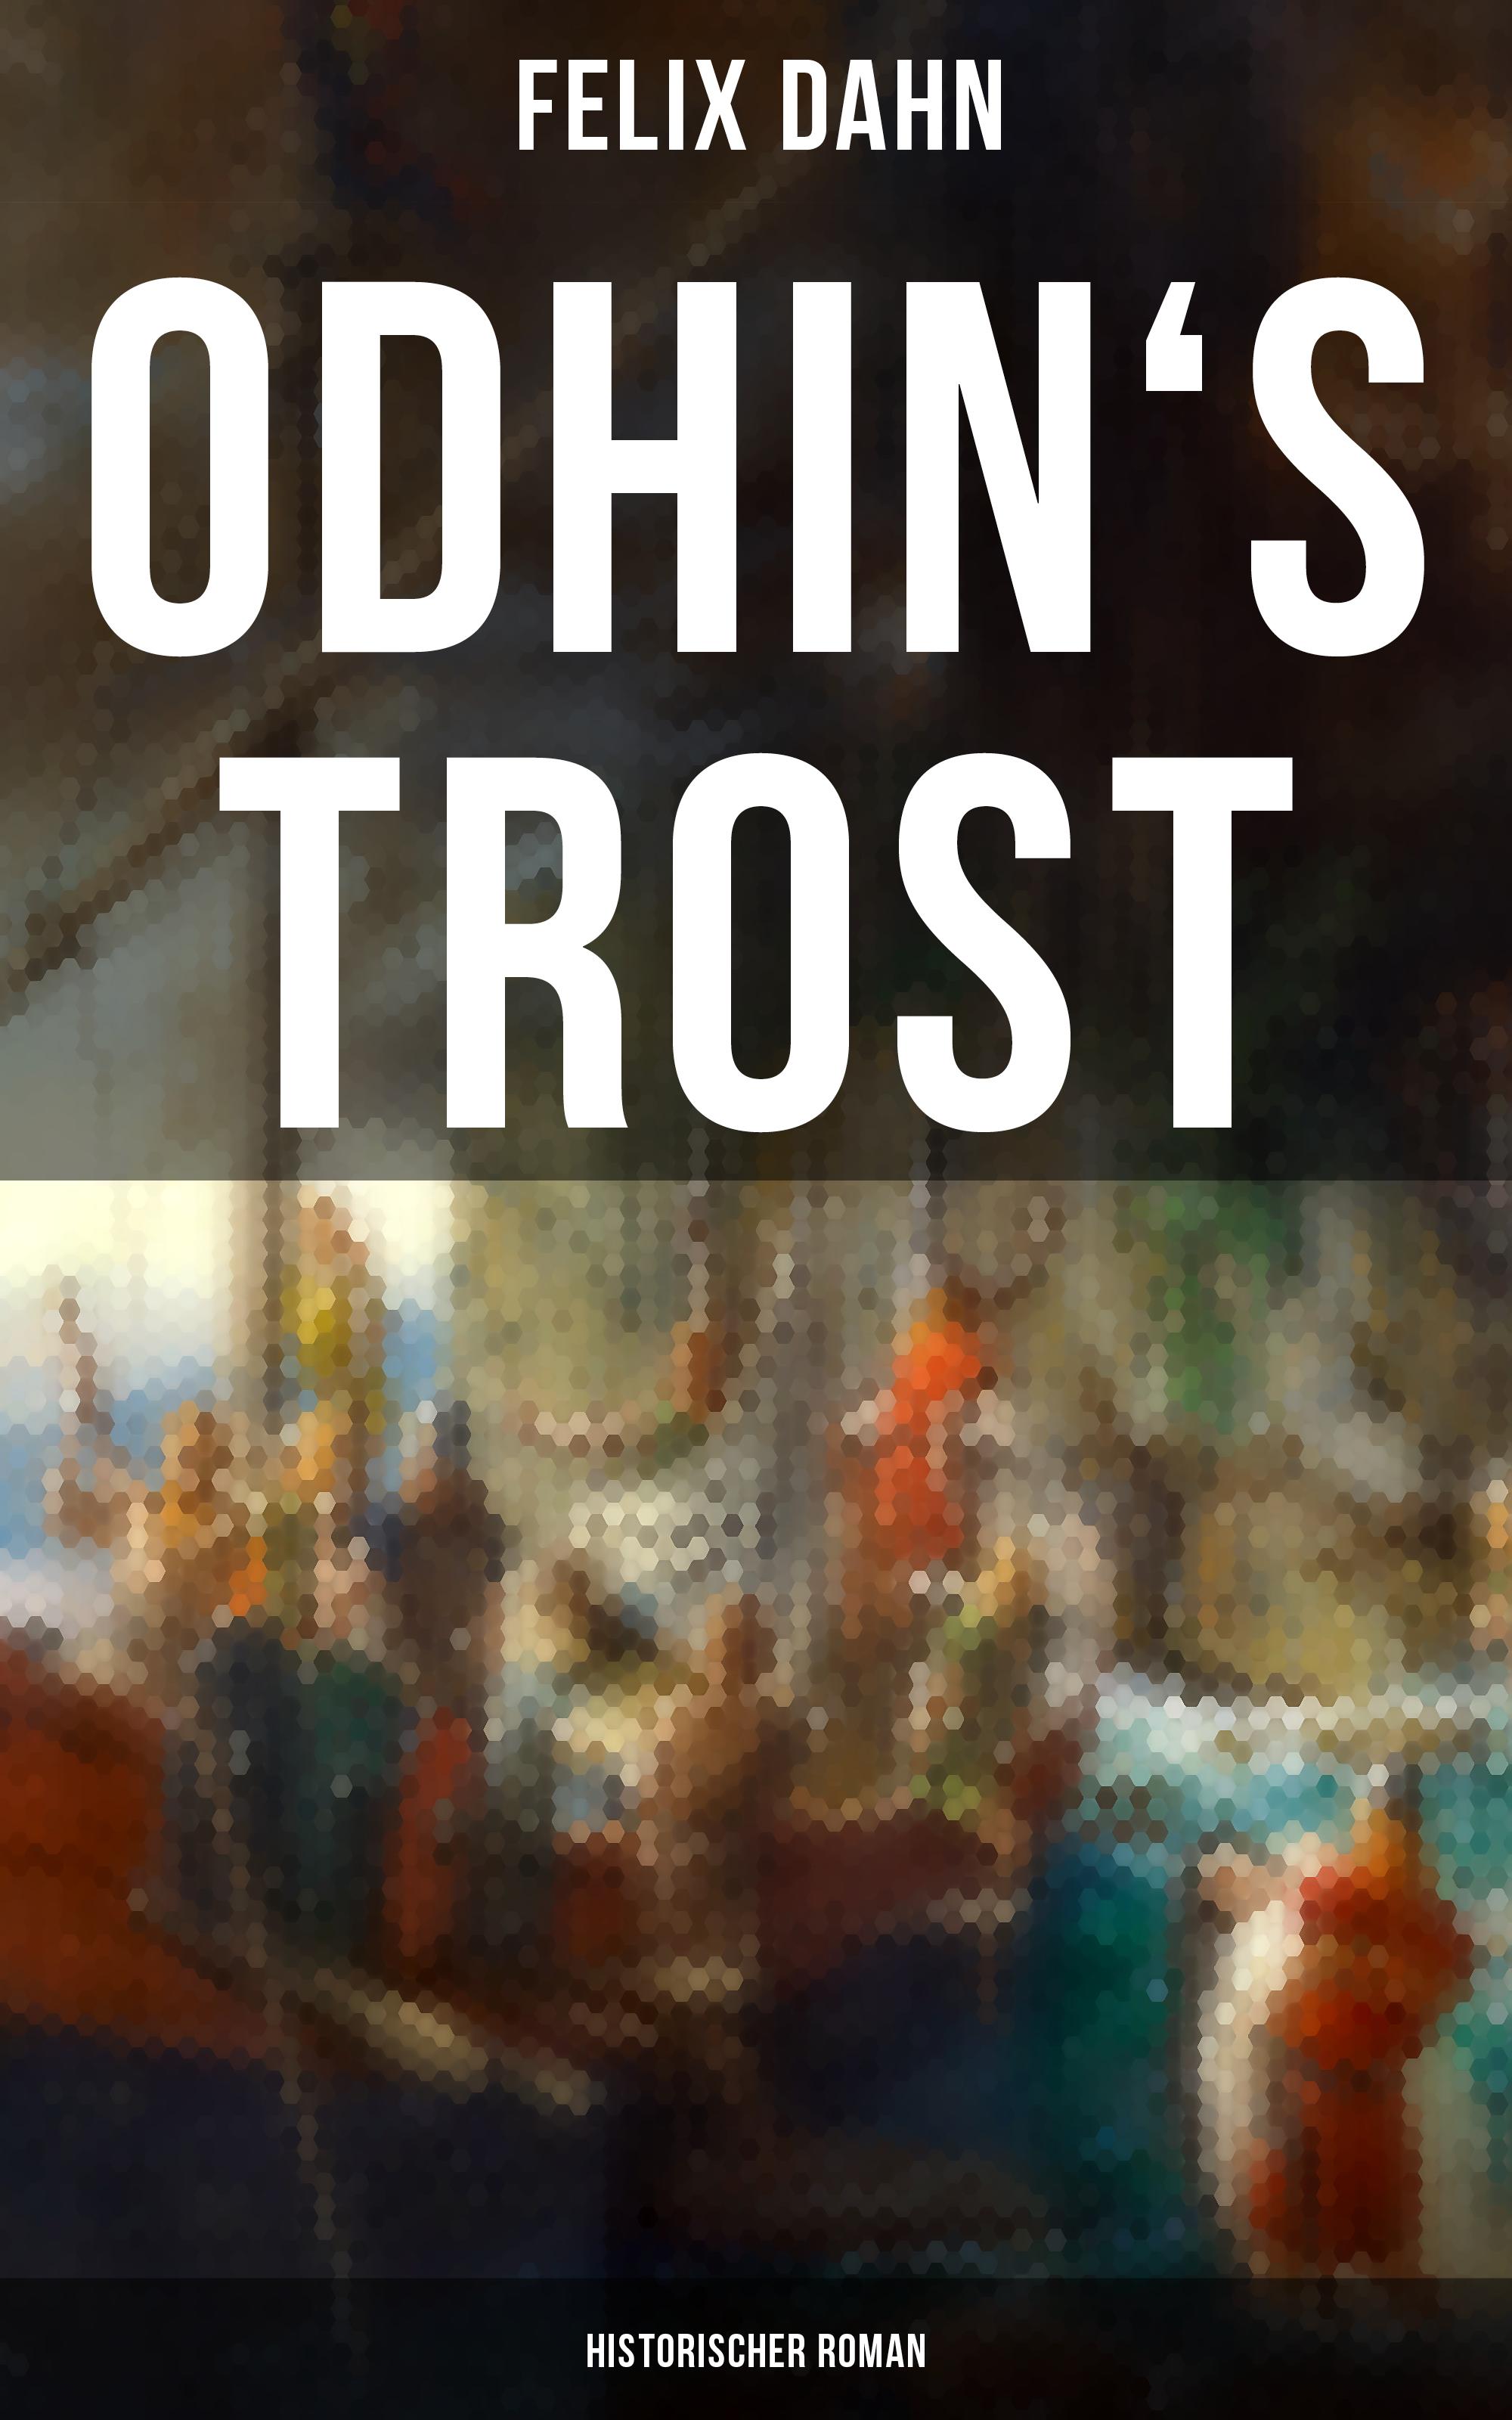 Felix Dahn Odhin's Trost: Historischer Roman edit trost adolph menzel